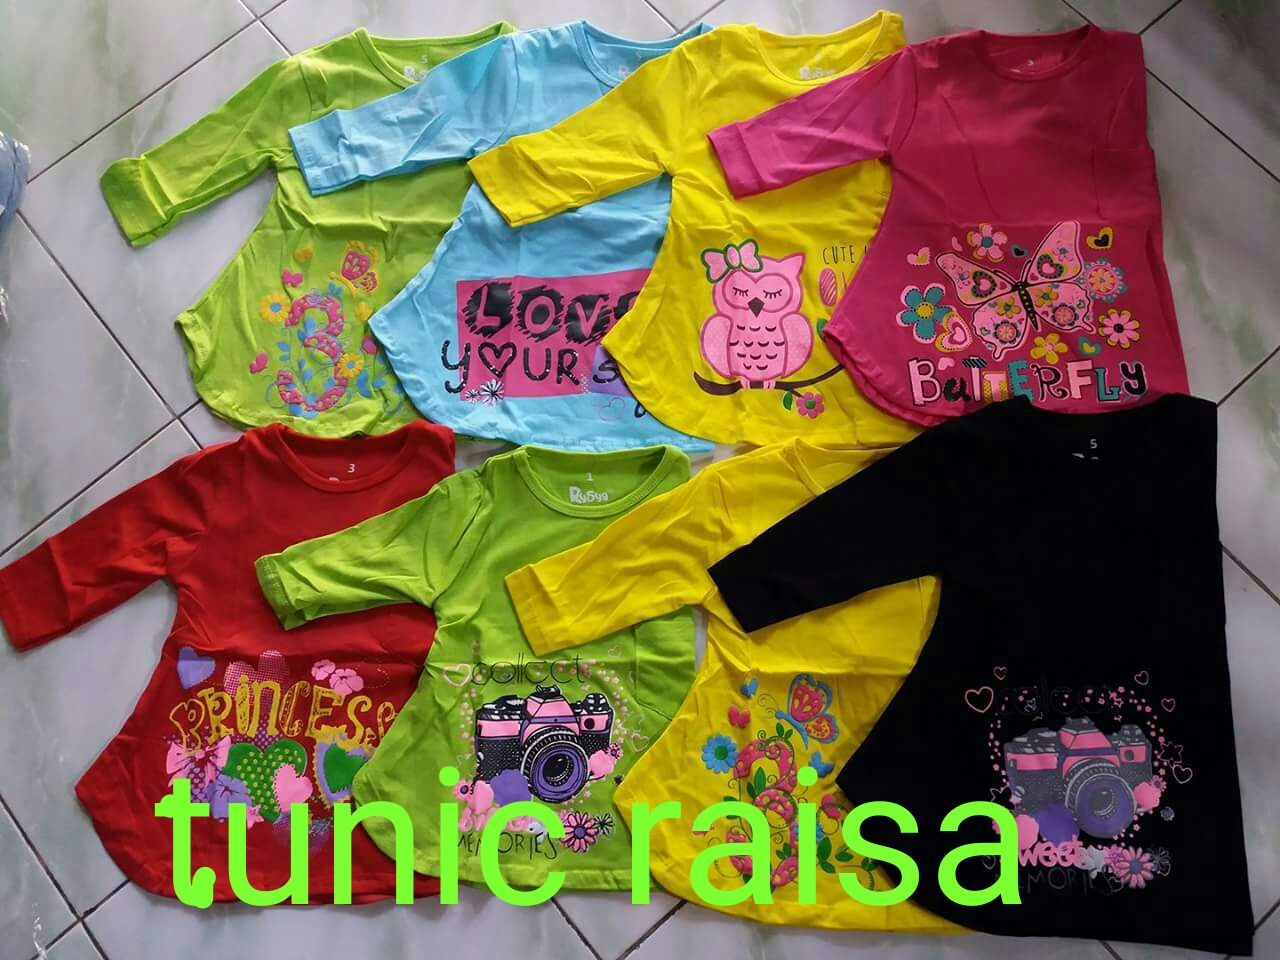 Grosiran Murah di Bandung Grosir Baju Tunic Raisa Anak Perempuan Termurah Rp.17.500